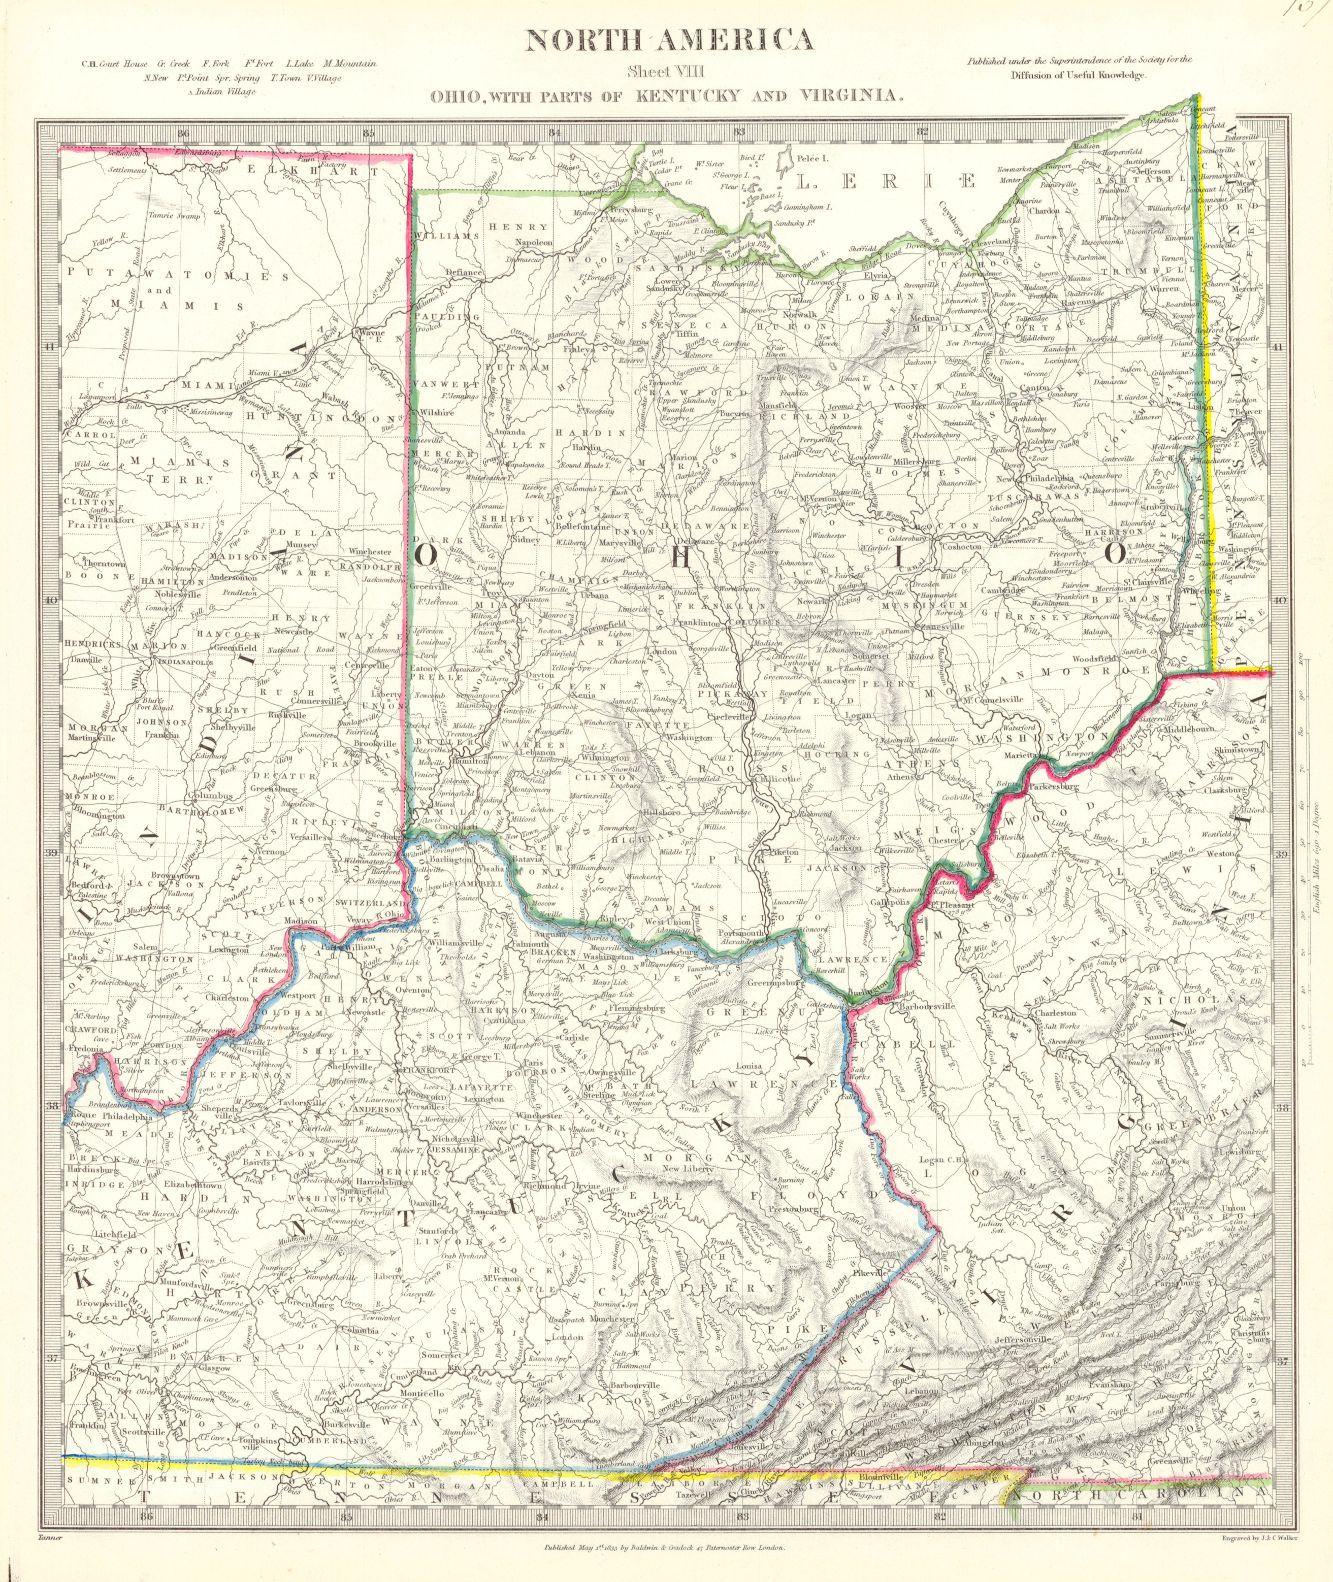 Kentucky Road Map Street on united states map, murray sea map, kentucky transport map, kentucky lake map, kentucky vegetation map, interactive kentucky map, 4th grade tennessee map, ohio kentucky tennessee map, kentucky drainage map, kentucky interstate map, kentucky travel map, kentucky park map, kentucky trail map, kentucky flash, kentucky county map, ohio county map, kentucky railway map, kentucky outline map, kentucky street map, bourbon old map,